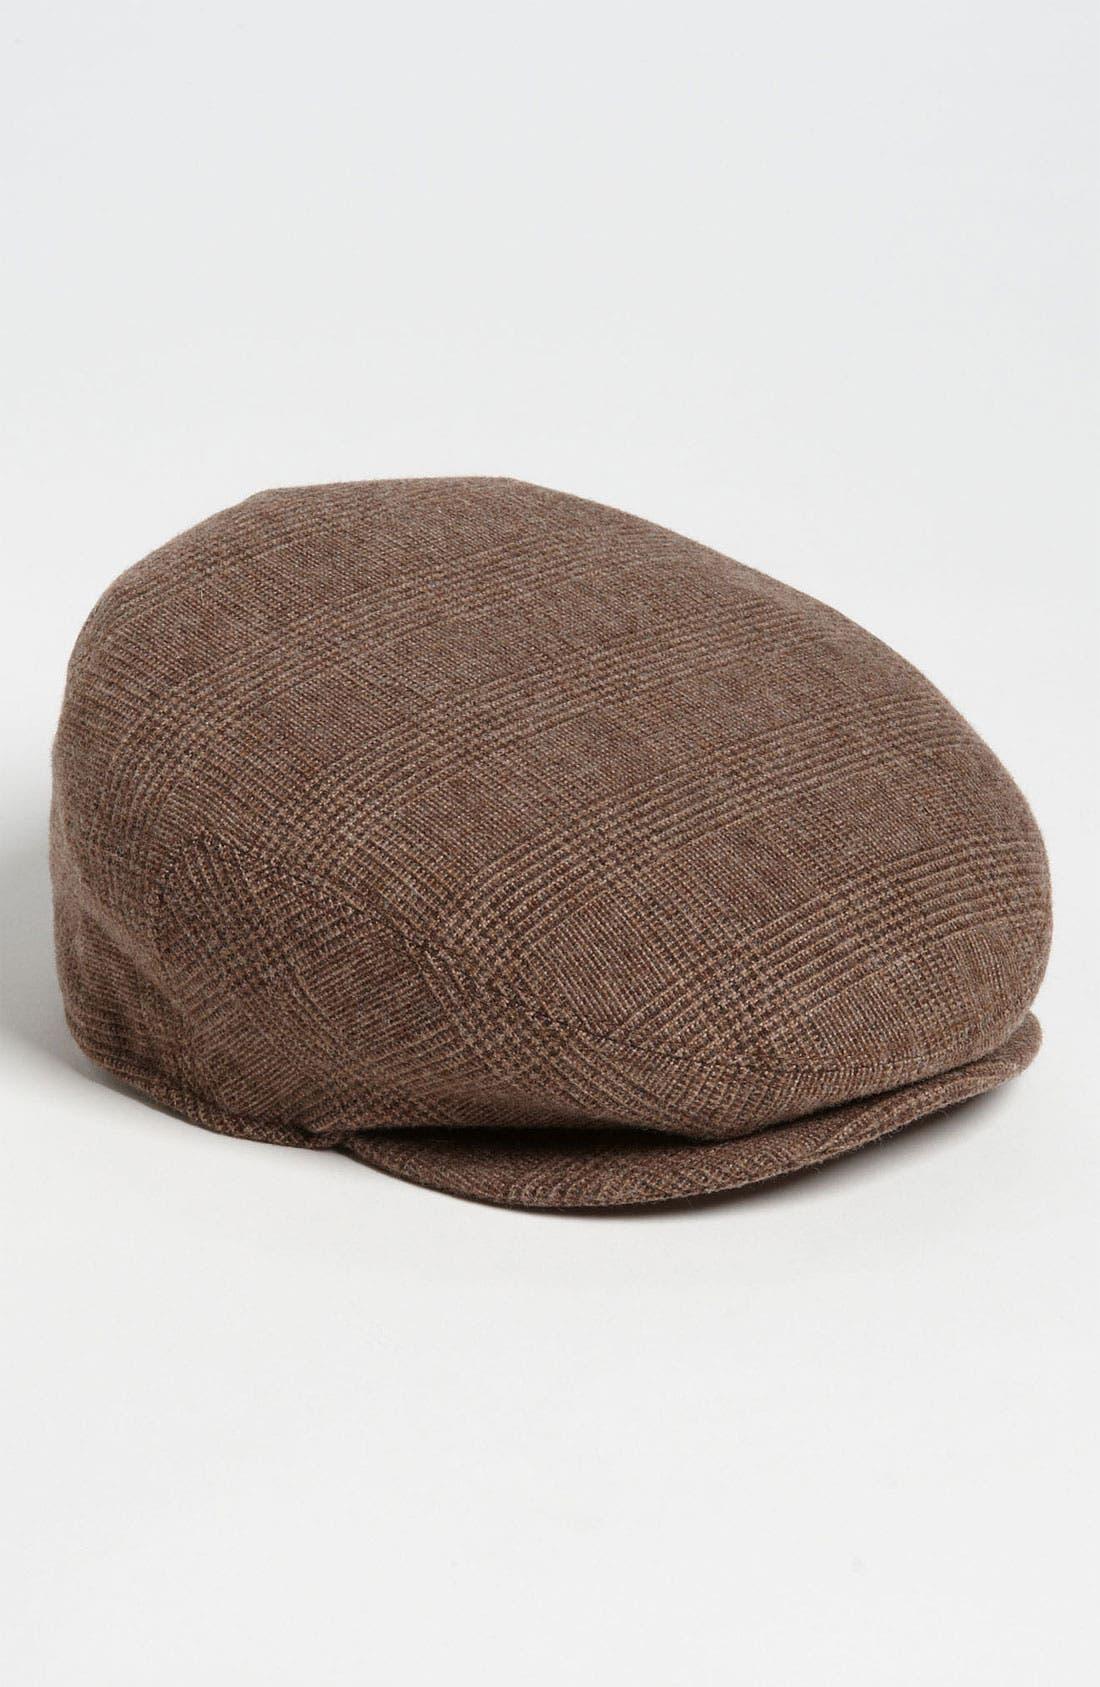 Main Image - Brooks Brothers 'Ivy' Tweed Cap